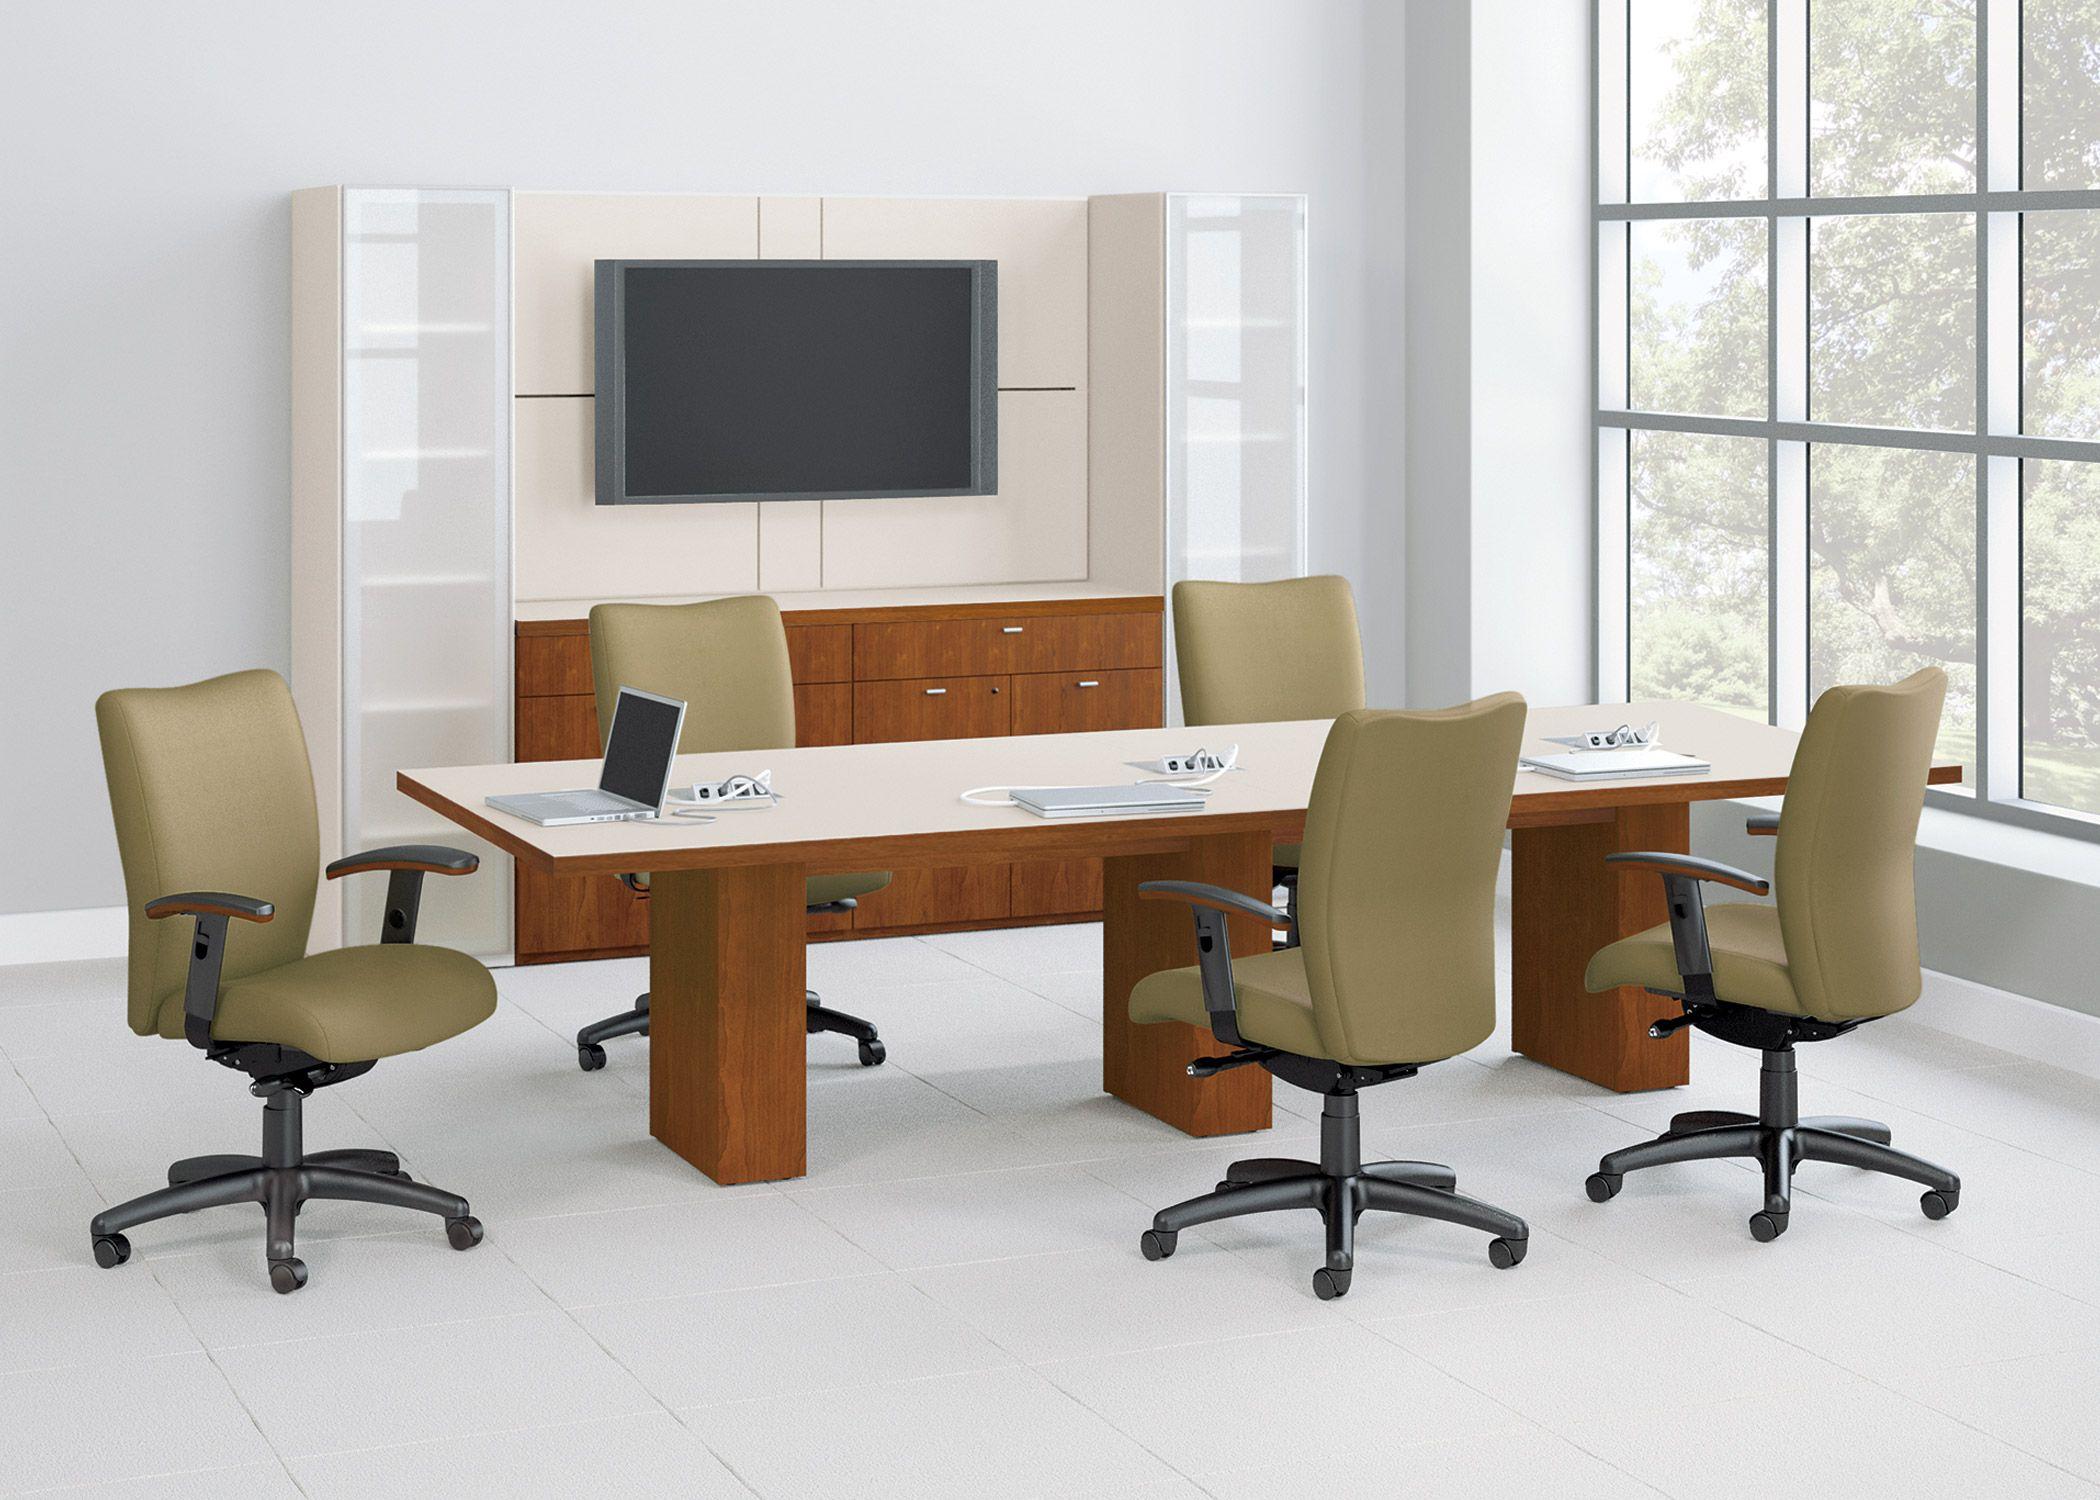 Miraculous Waveworks Tables National Office Furniture Human Download Free Architecture Designs Xoliawazosbritishbridgeorg